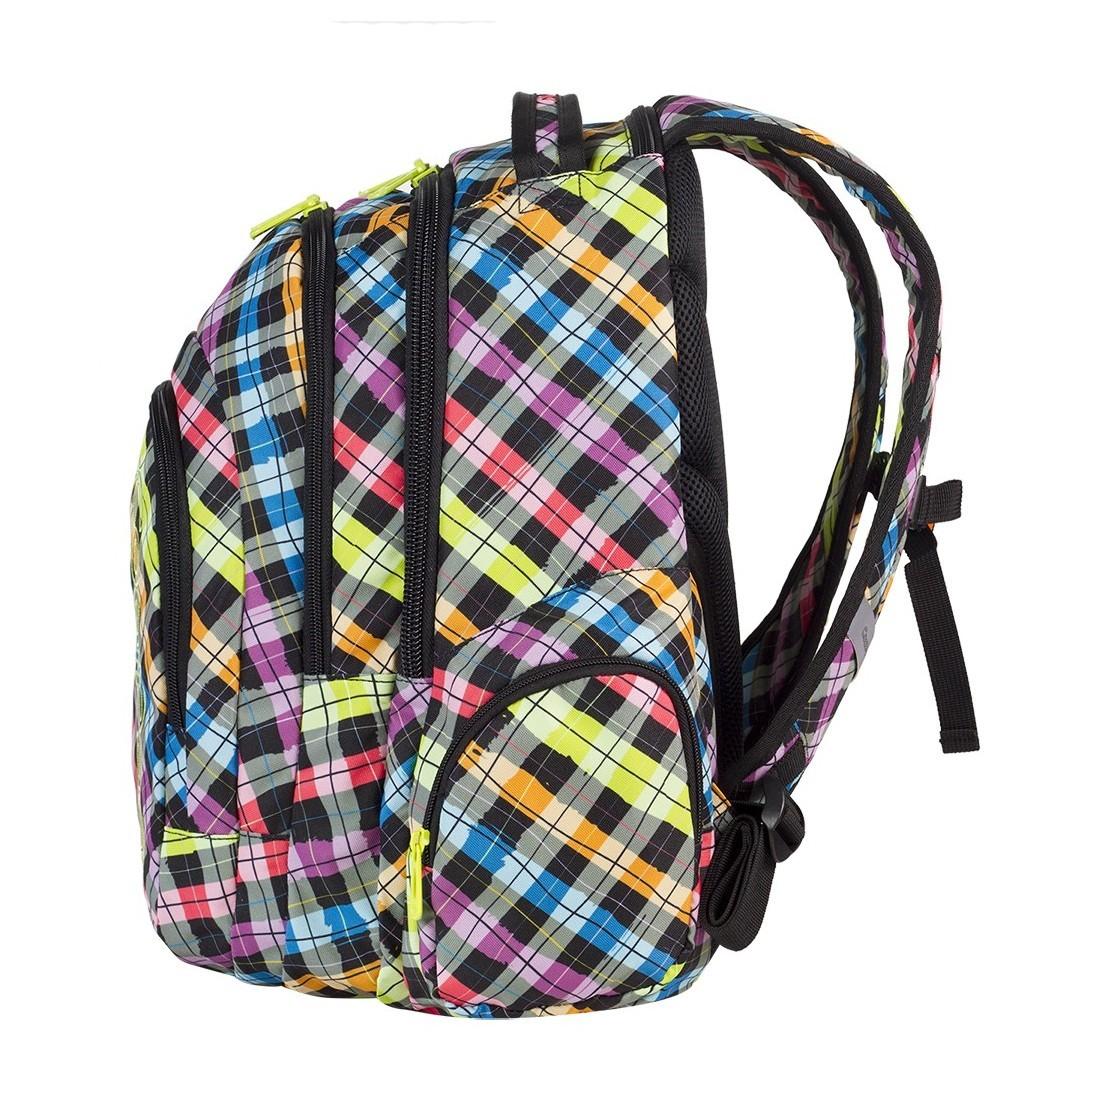 Plecak młodzieżowy CoolPack SPARK 3 przegrody COLOUR CHECK CP 525 - plecak-tornister.pl